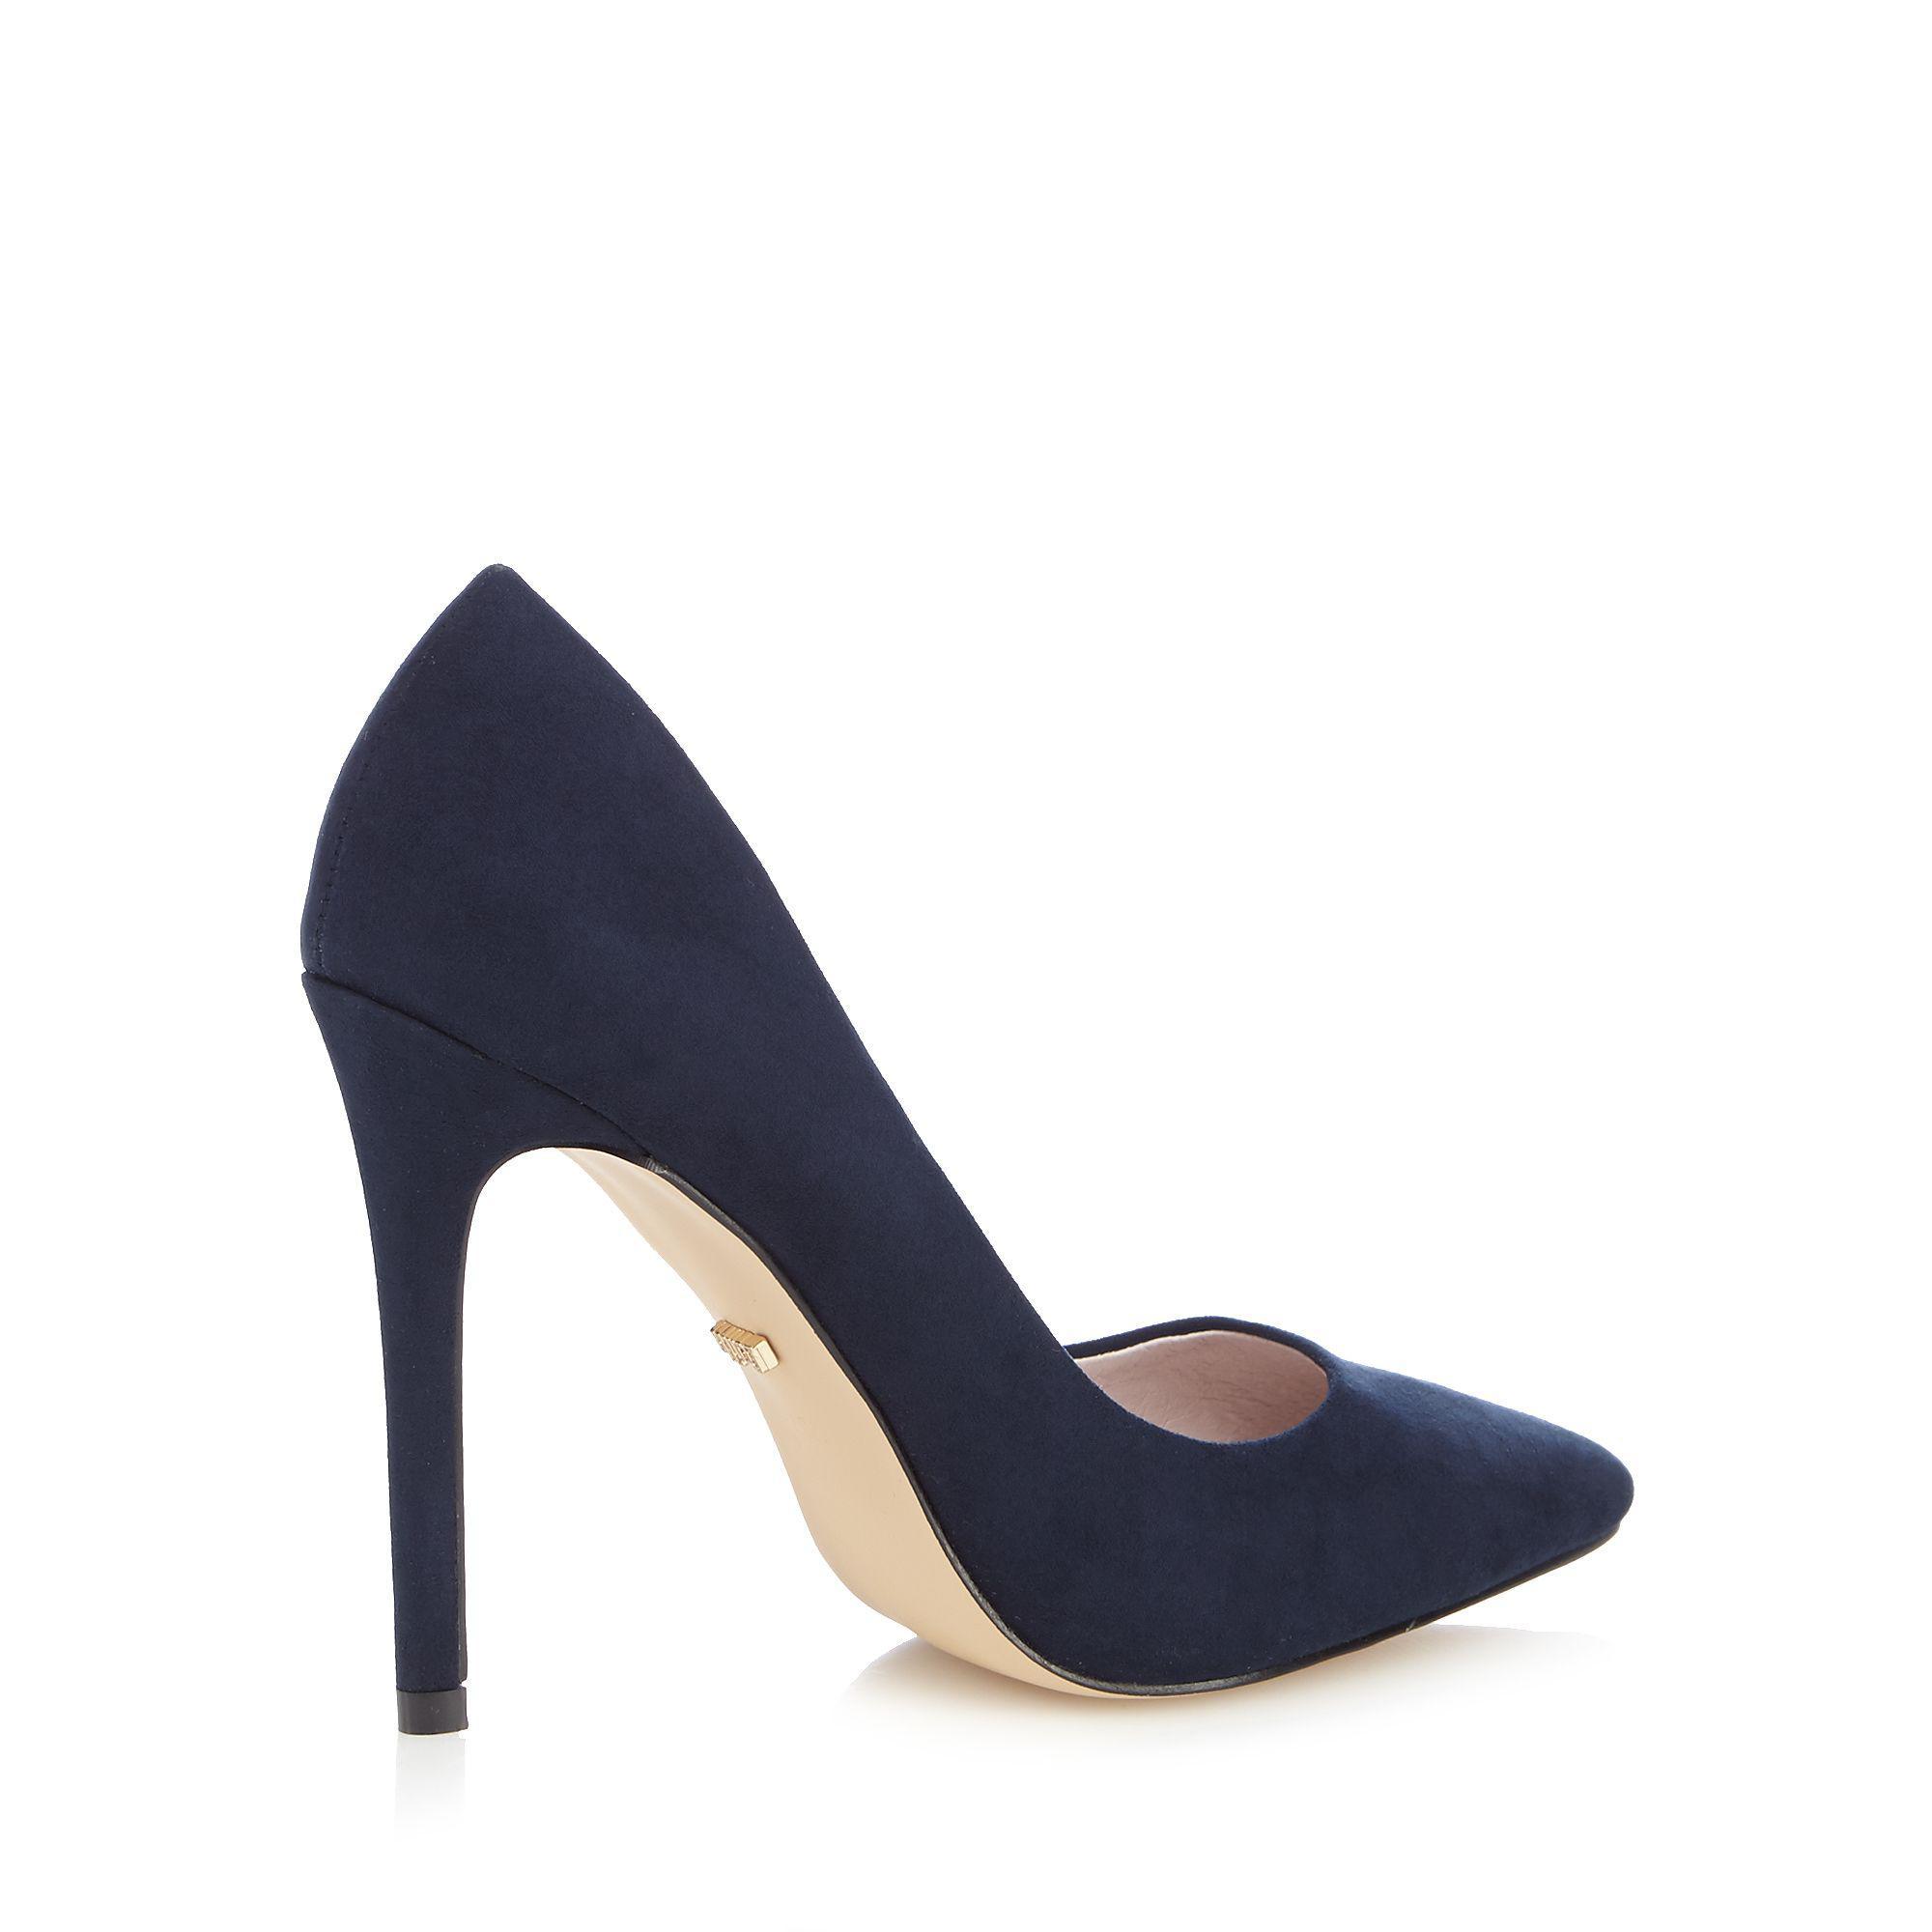 3cc970bd0baea1 Faith - Blue Navy  chloe  Wide Fit Court Shoes - Lyst. View fullscreen